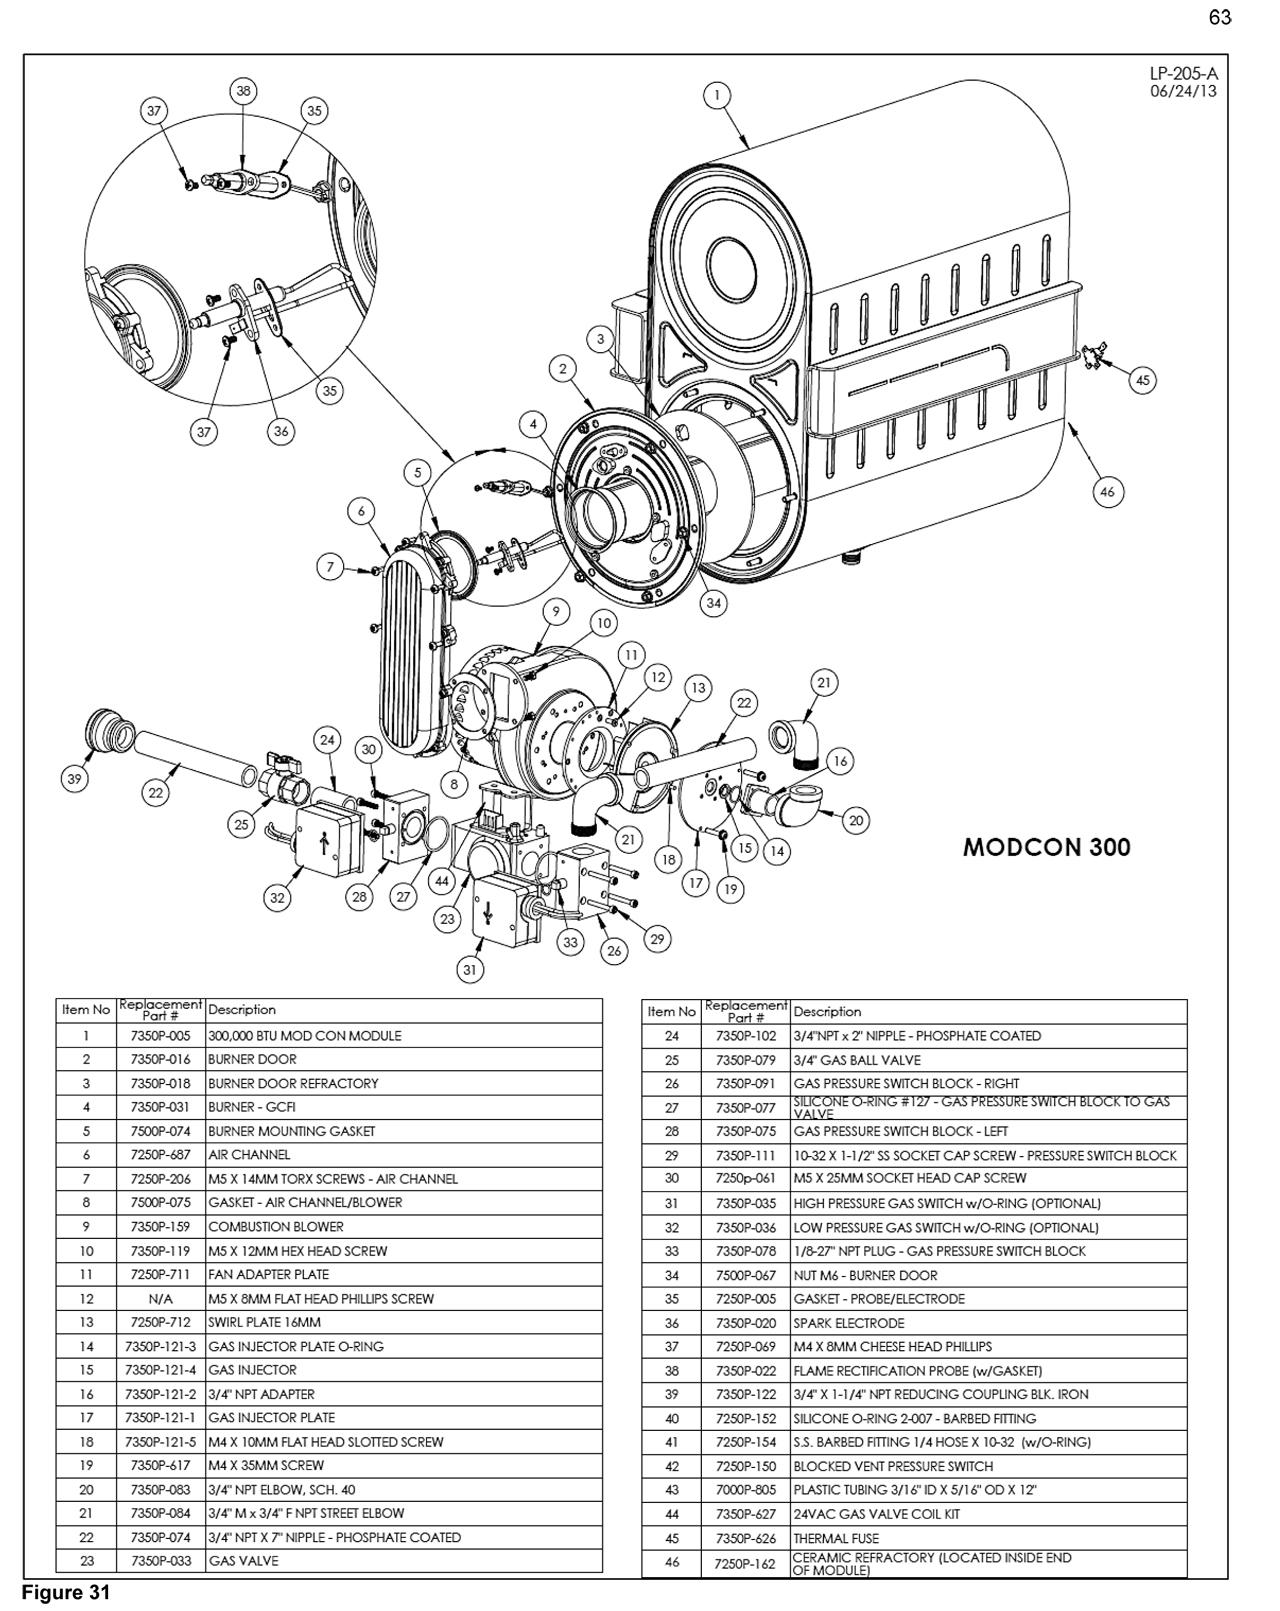 Mod Con Volume Water Heater Parts- HTP